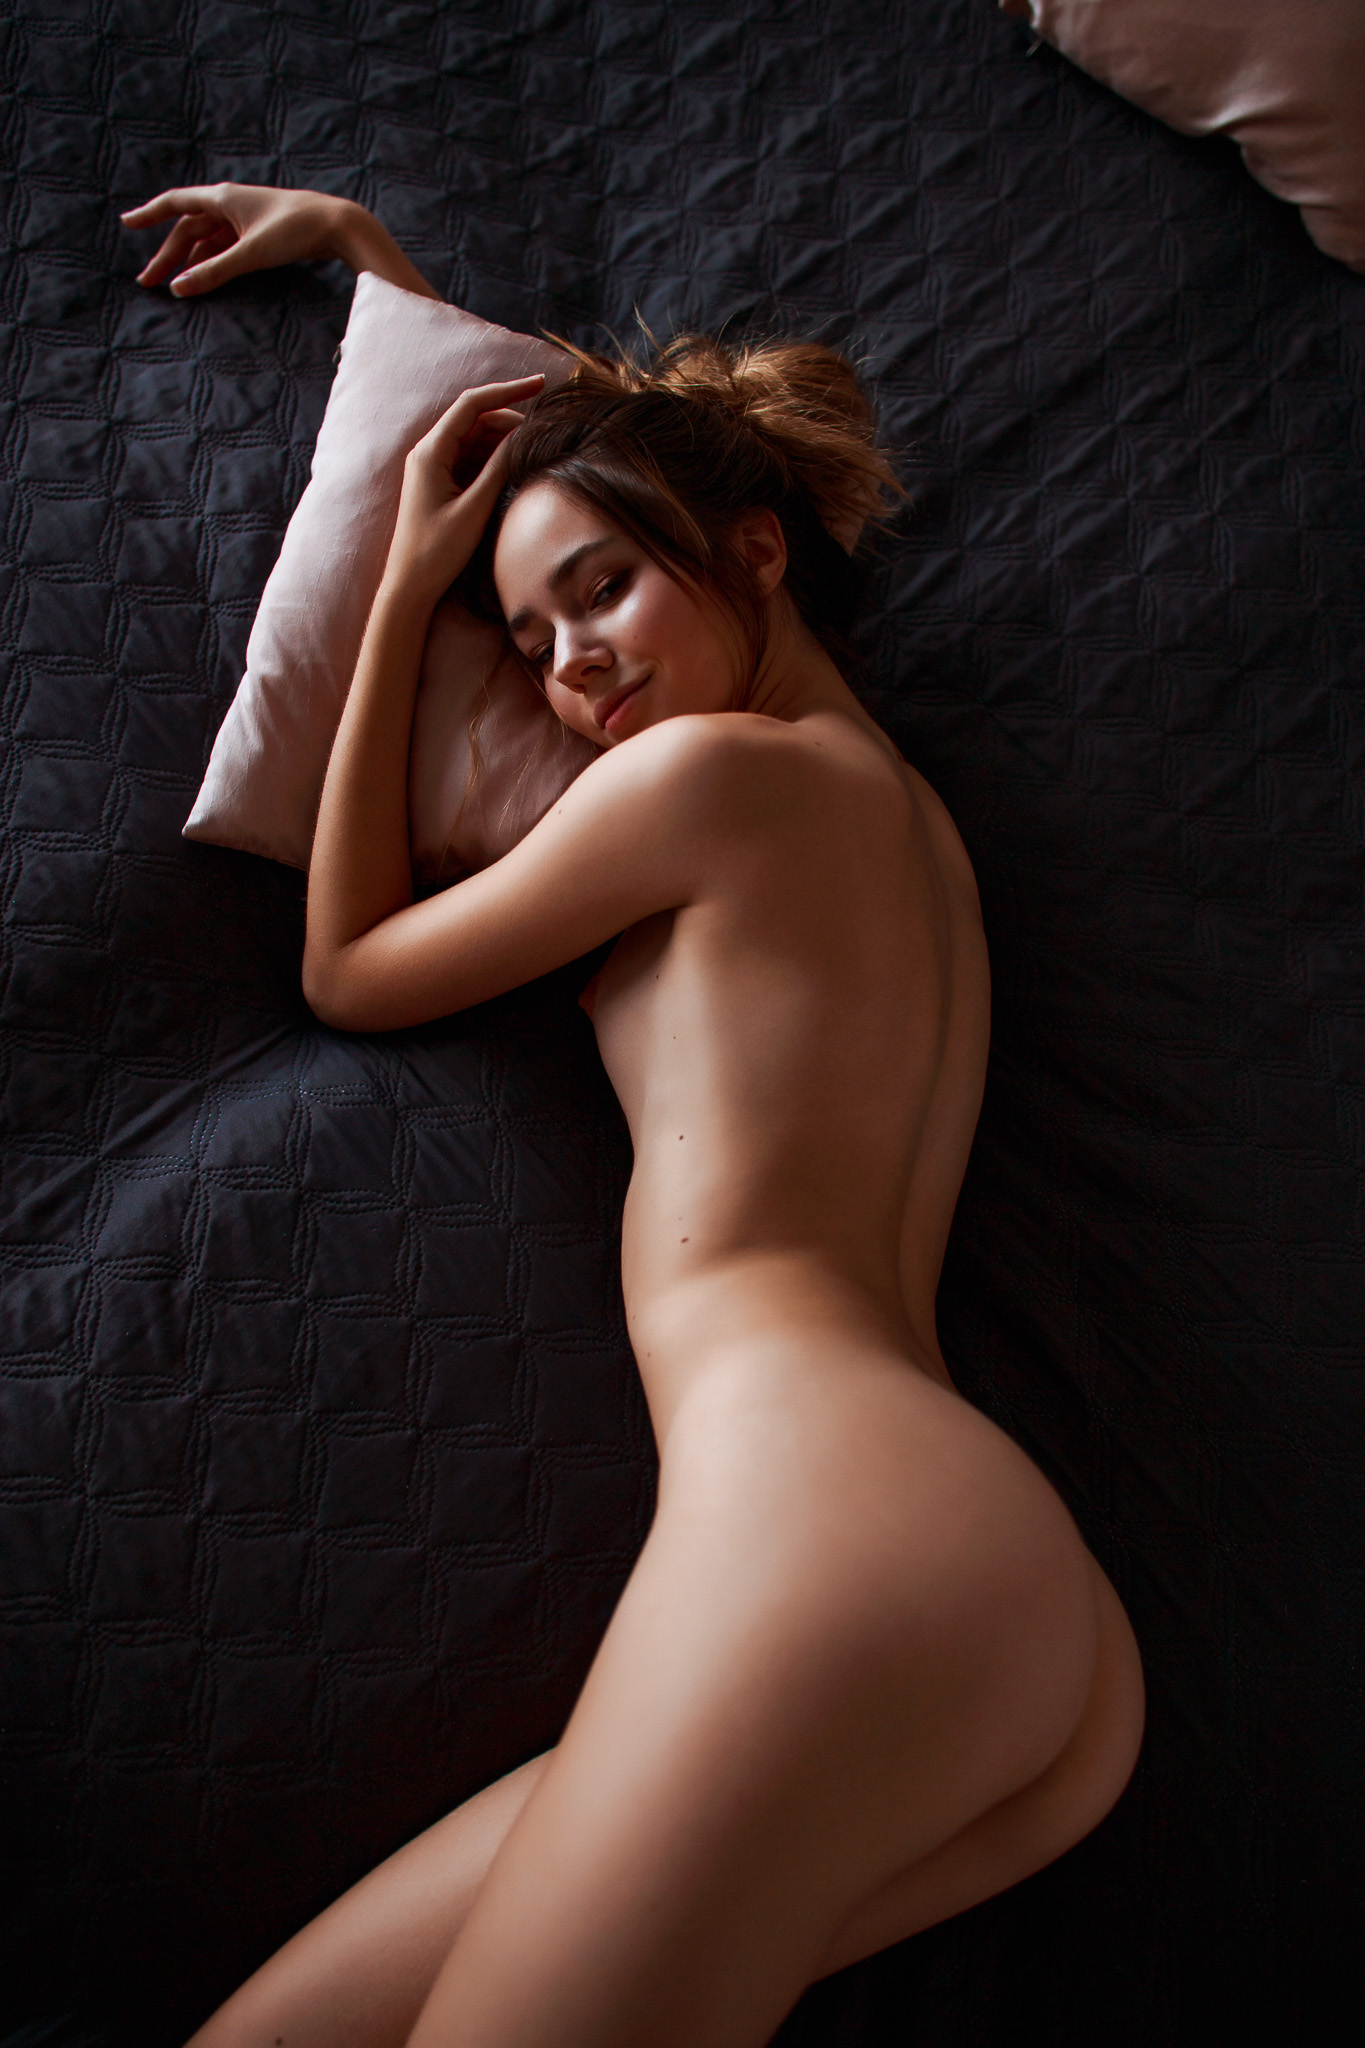 Natalia Muchova by Michal Pales